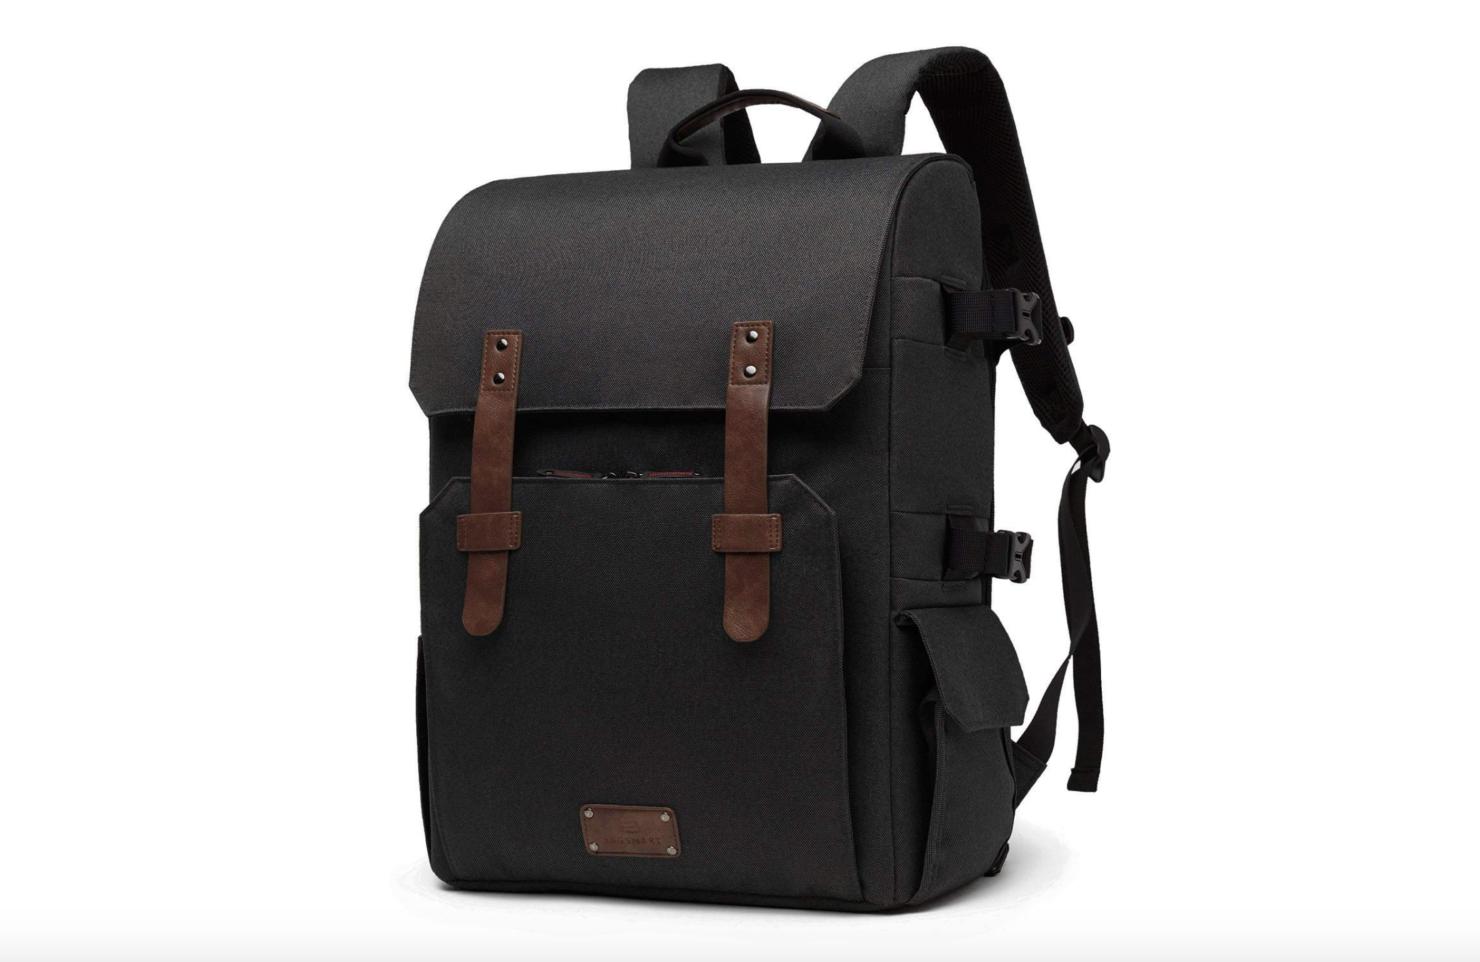 camera-bag-with-tripod